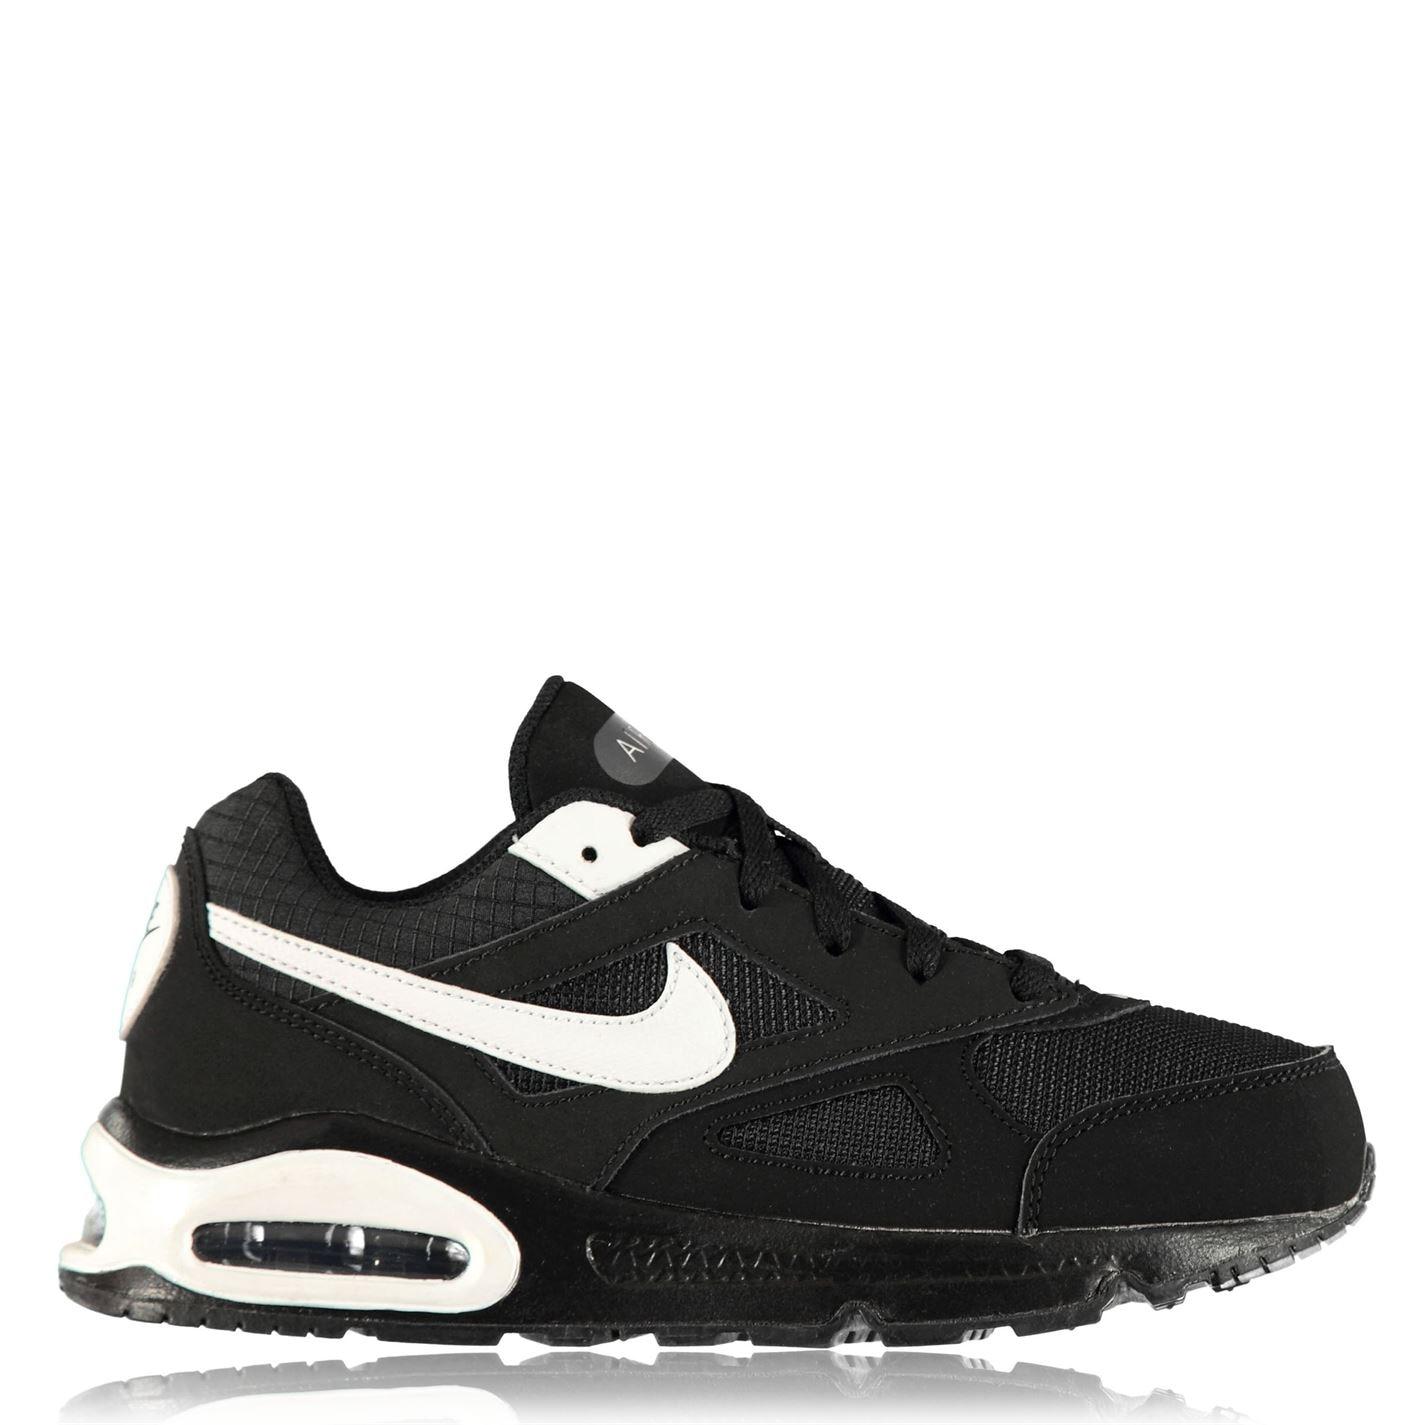 Nike Air Max Ivo Child Boys Trainers Black/White